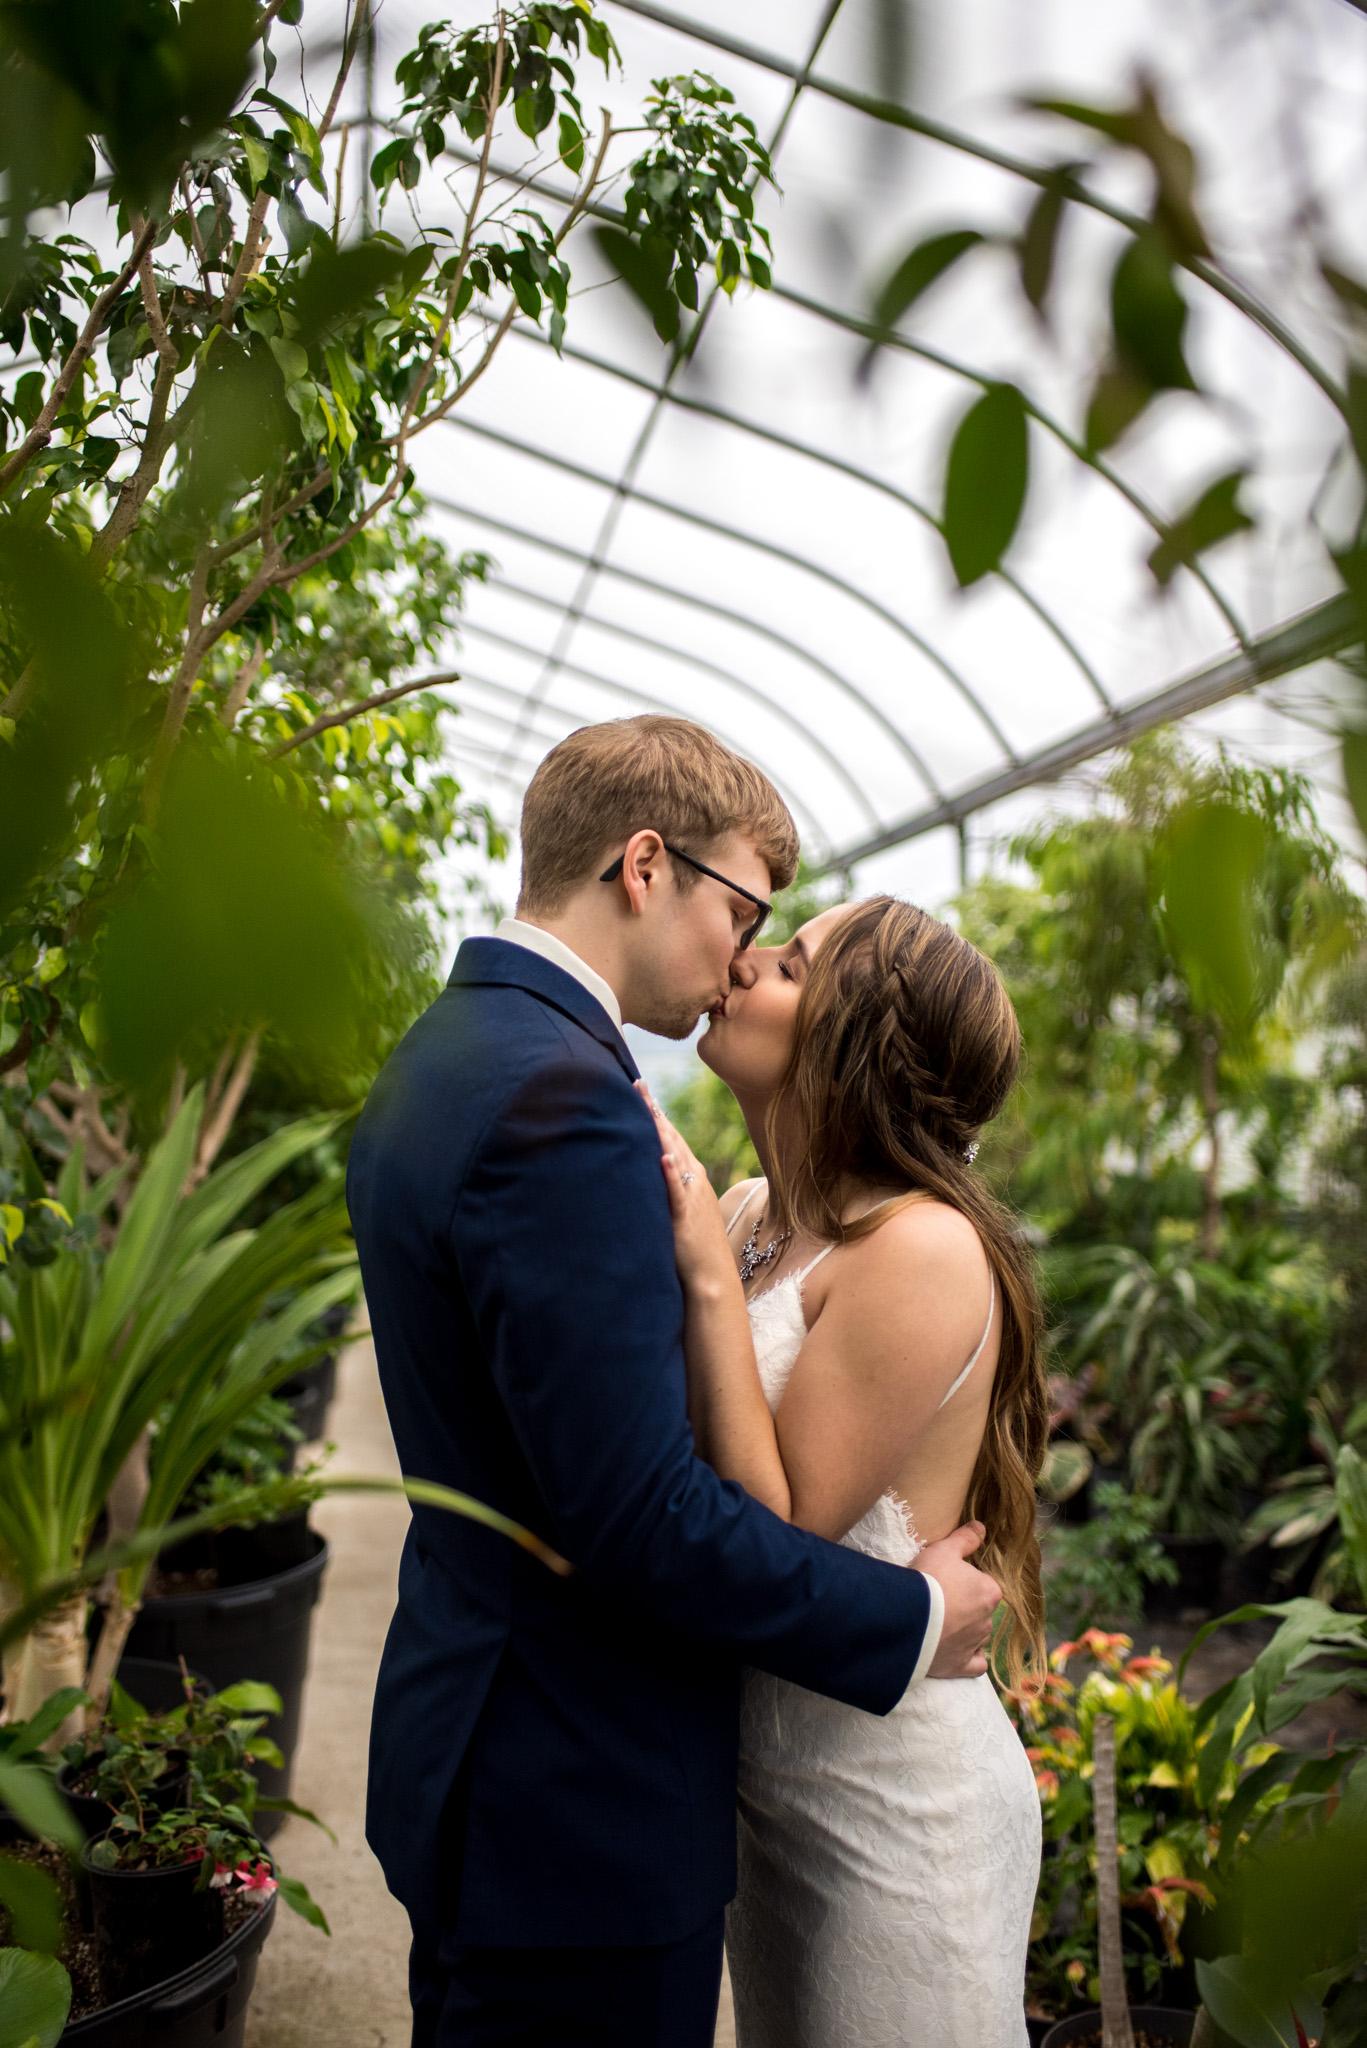 Abbotsford Wedding Photographer-55.jpg